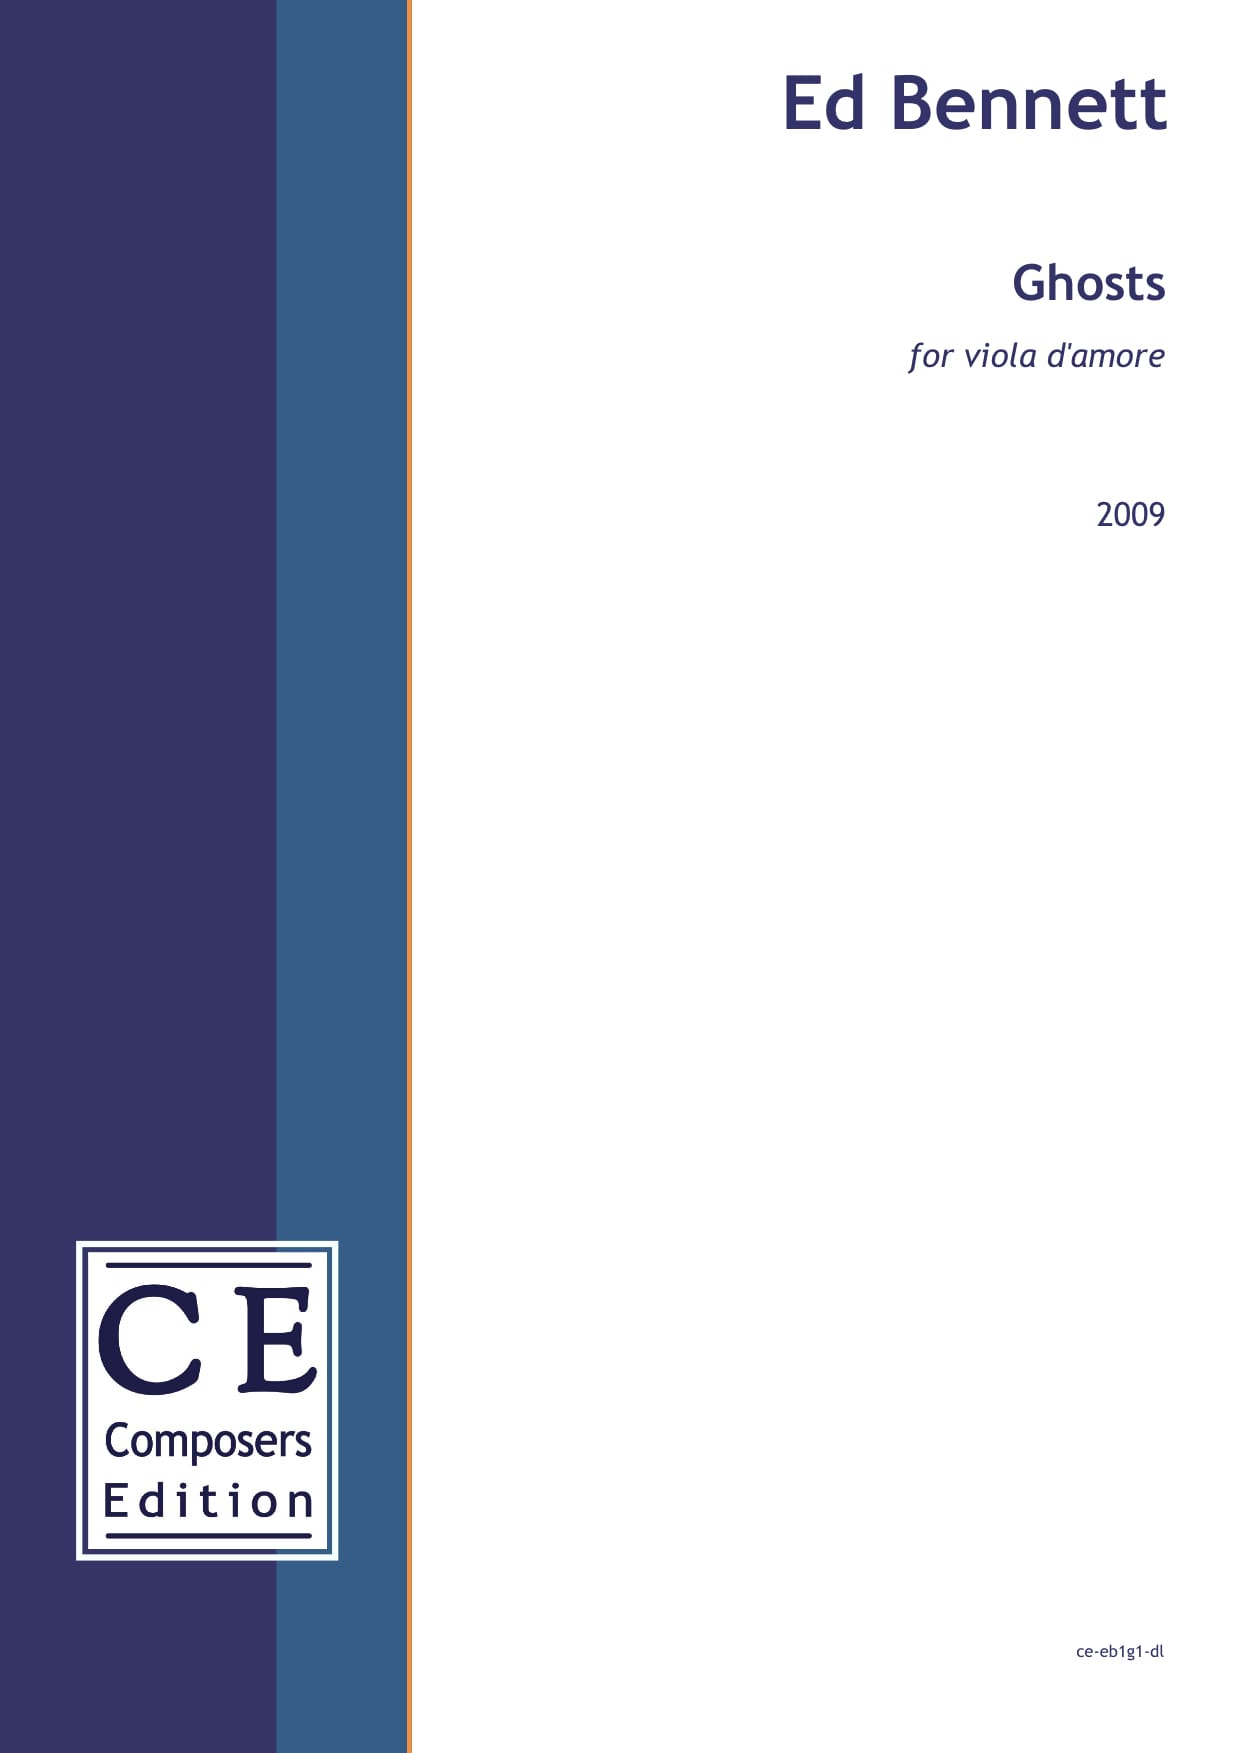 Ed Bennett: Ghosts for viola d'amore